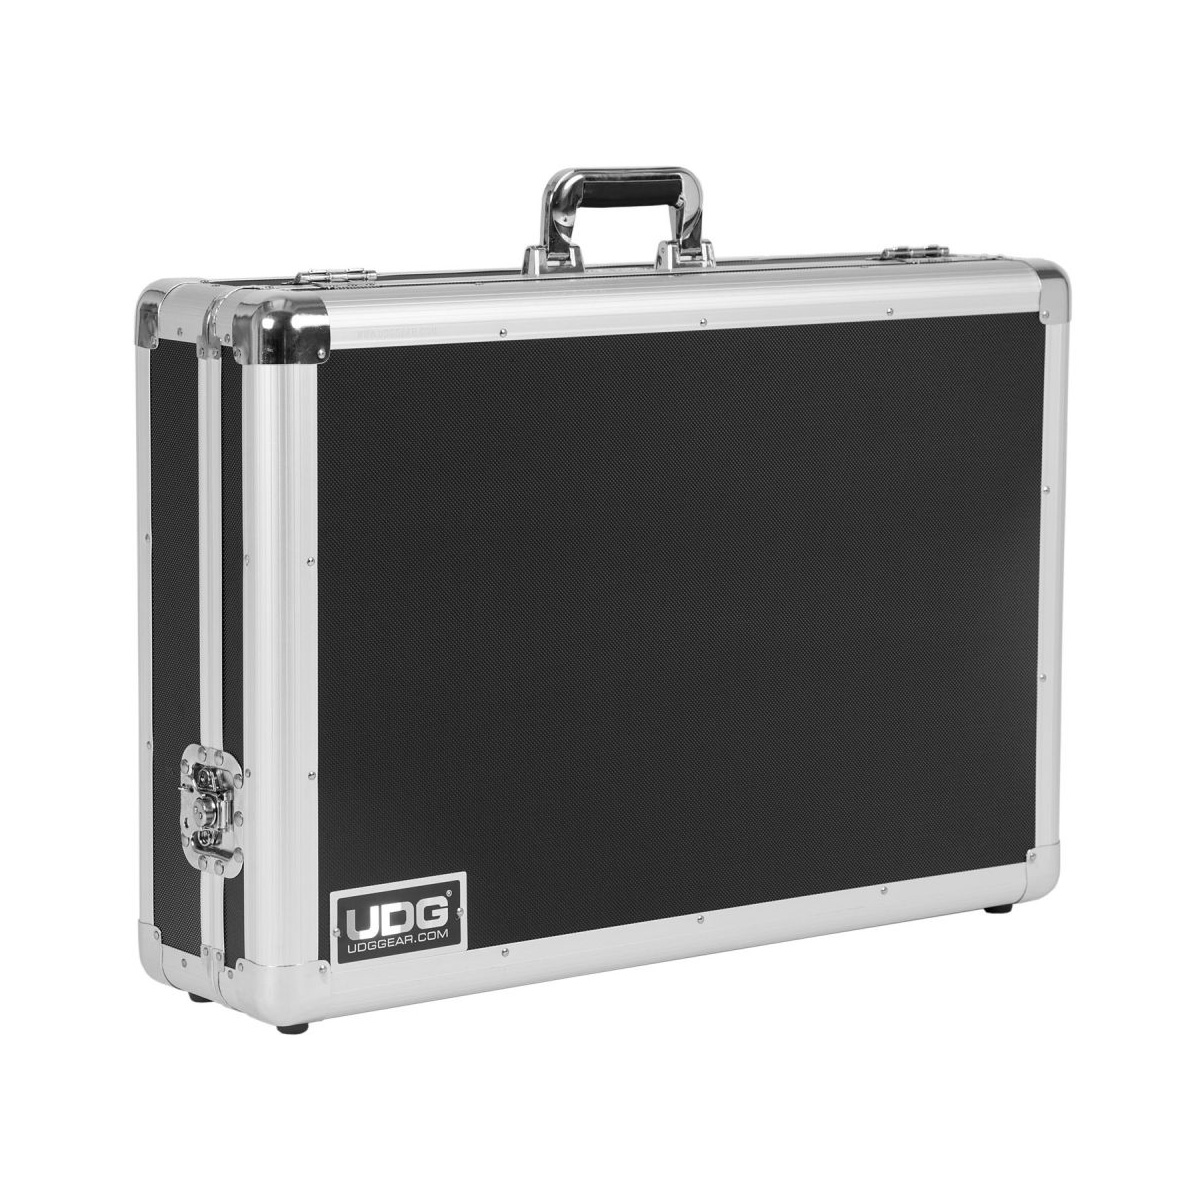 Case para controladora DJ XL UDG U93013SL